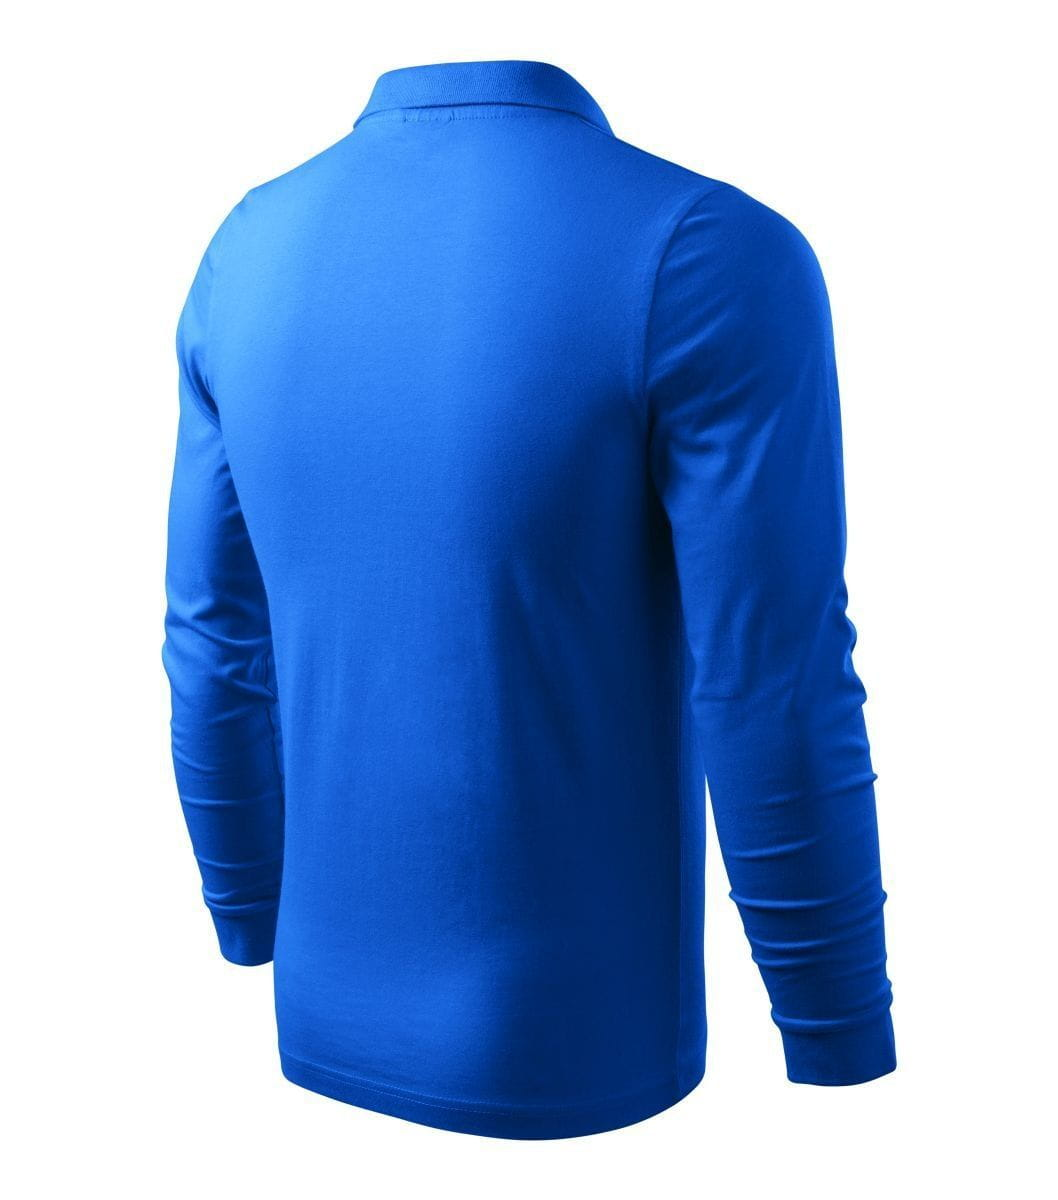 Męska koszulka Polo Malfini długi rękaw Single Jersey LS (Adler)